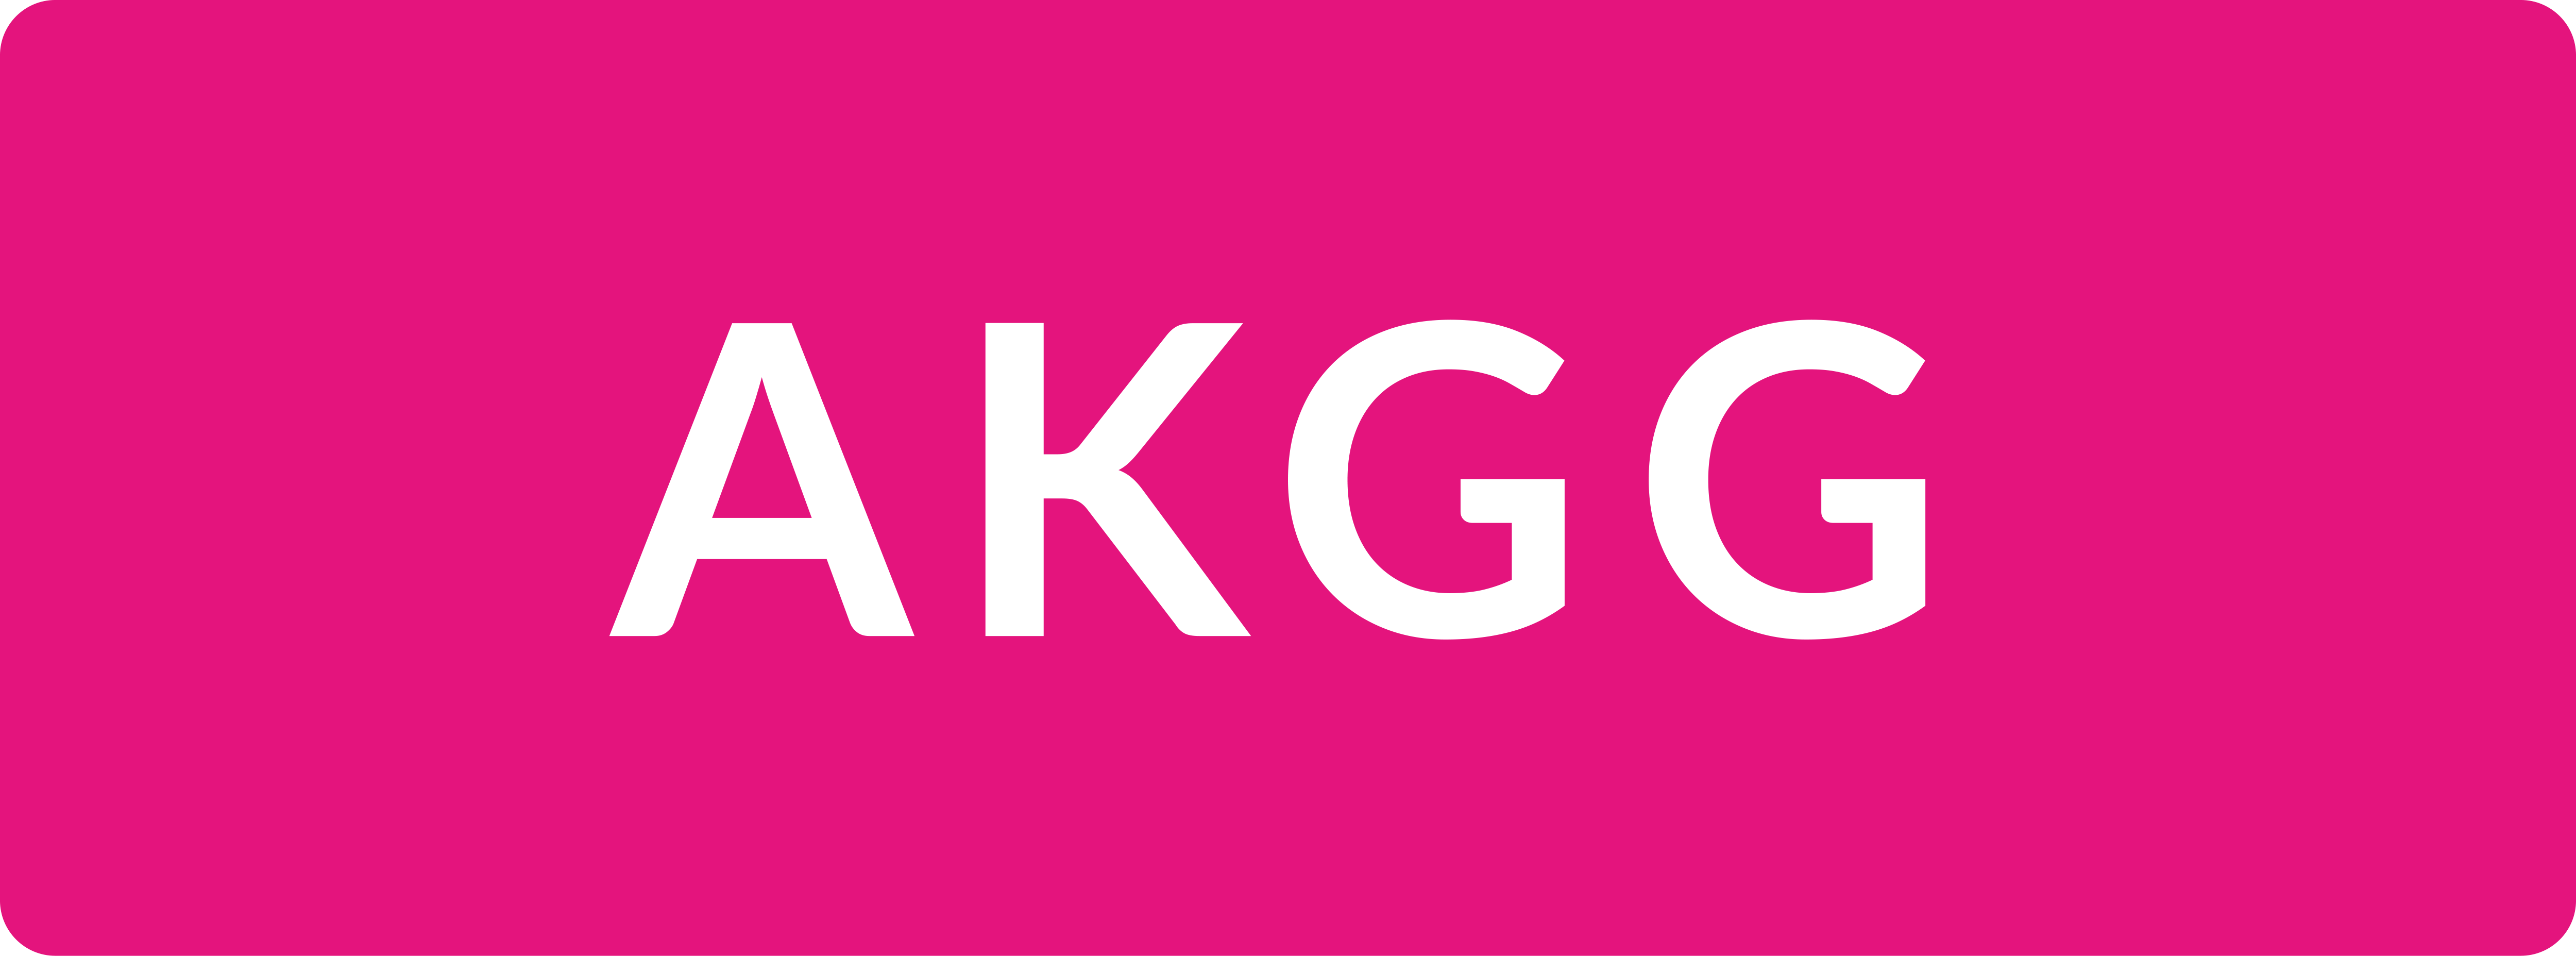 Logo des Beratungszentrums AKGG